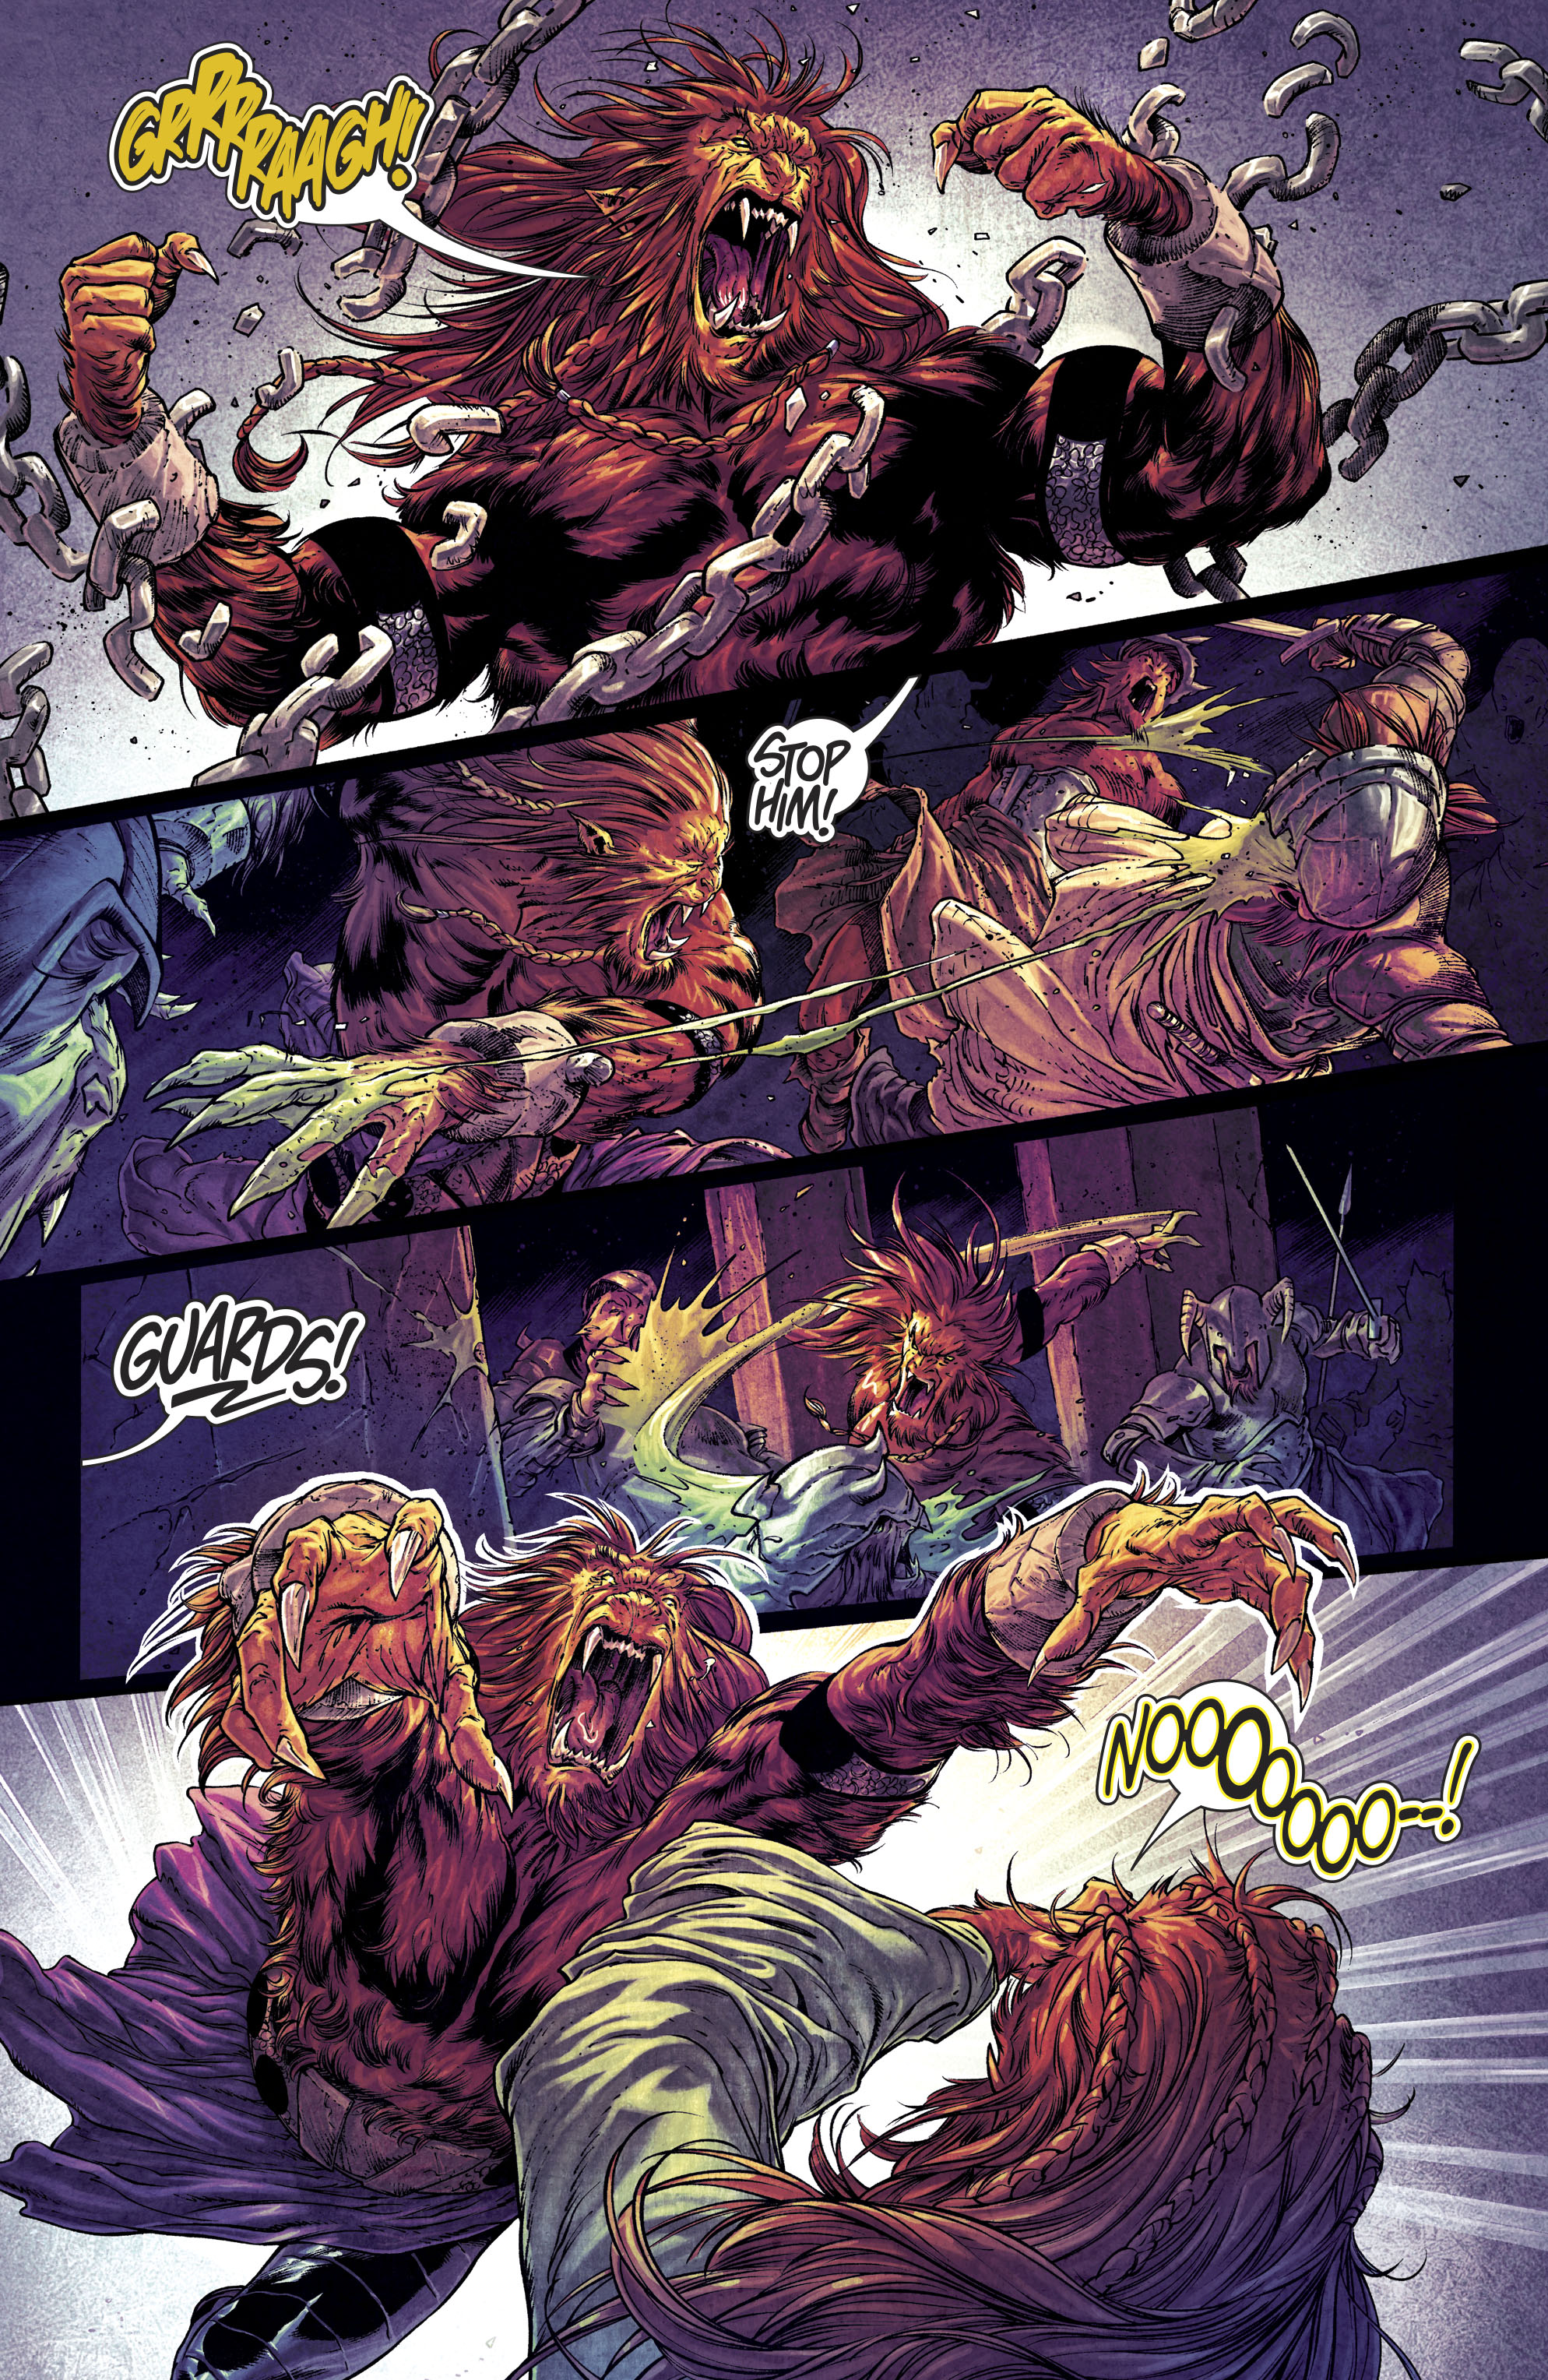 Read online Green Lanterns comic -  Issue #25 - 10